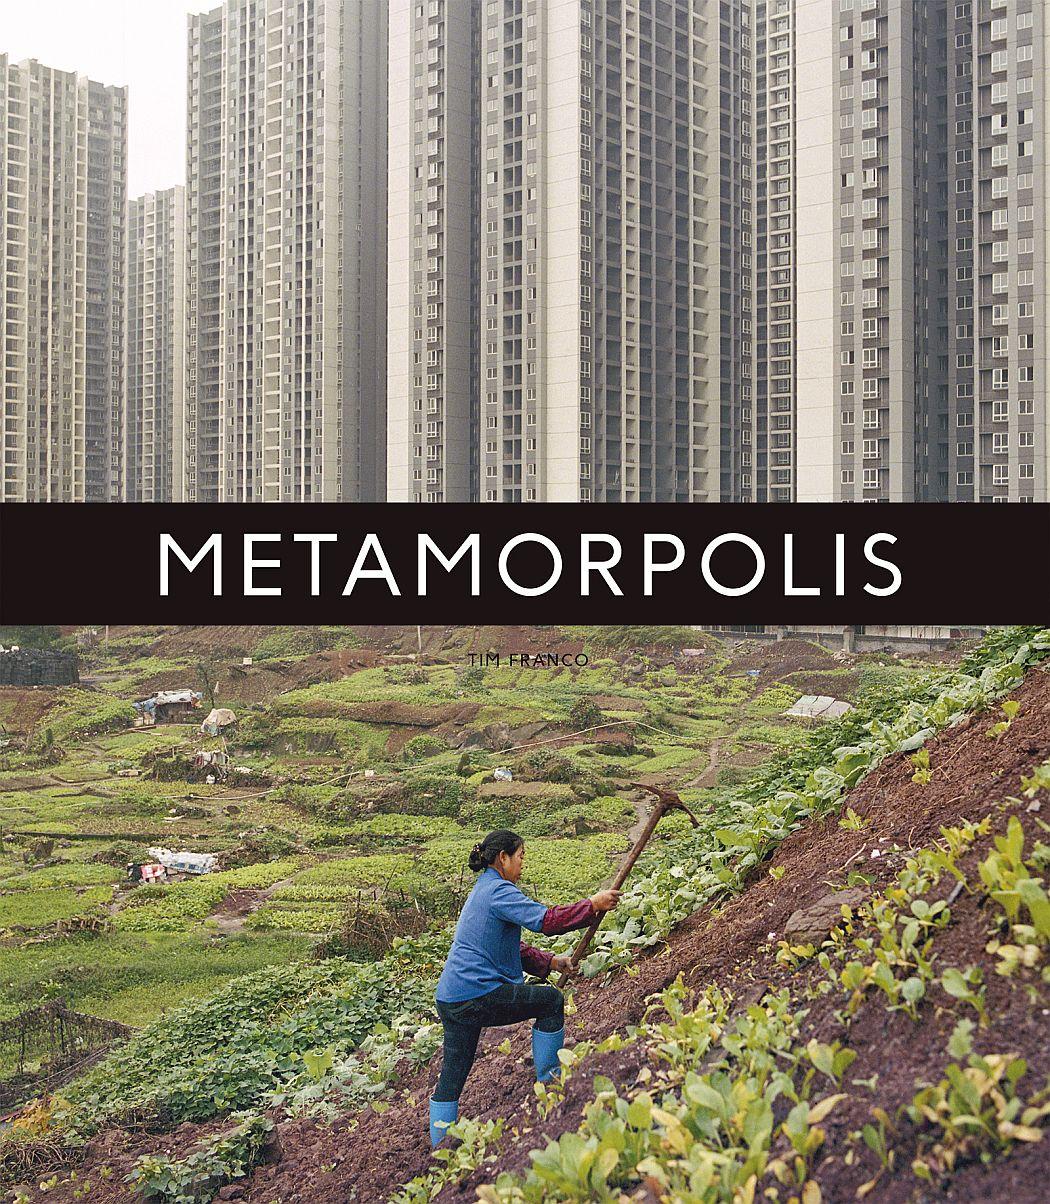 tim-franco-metamorpolis-00-cover